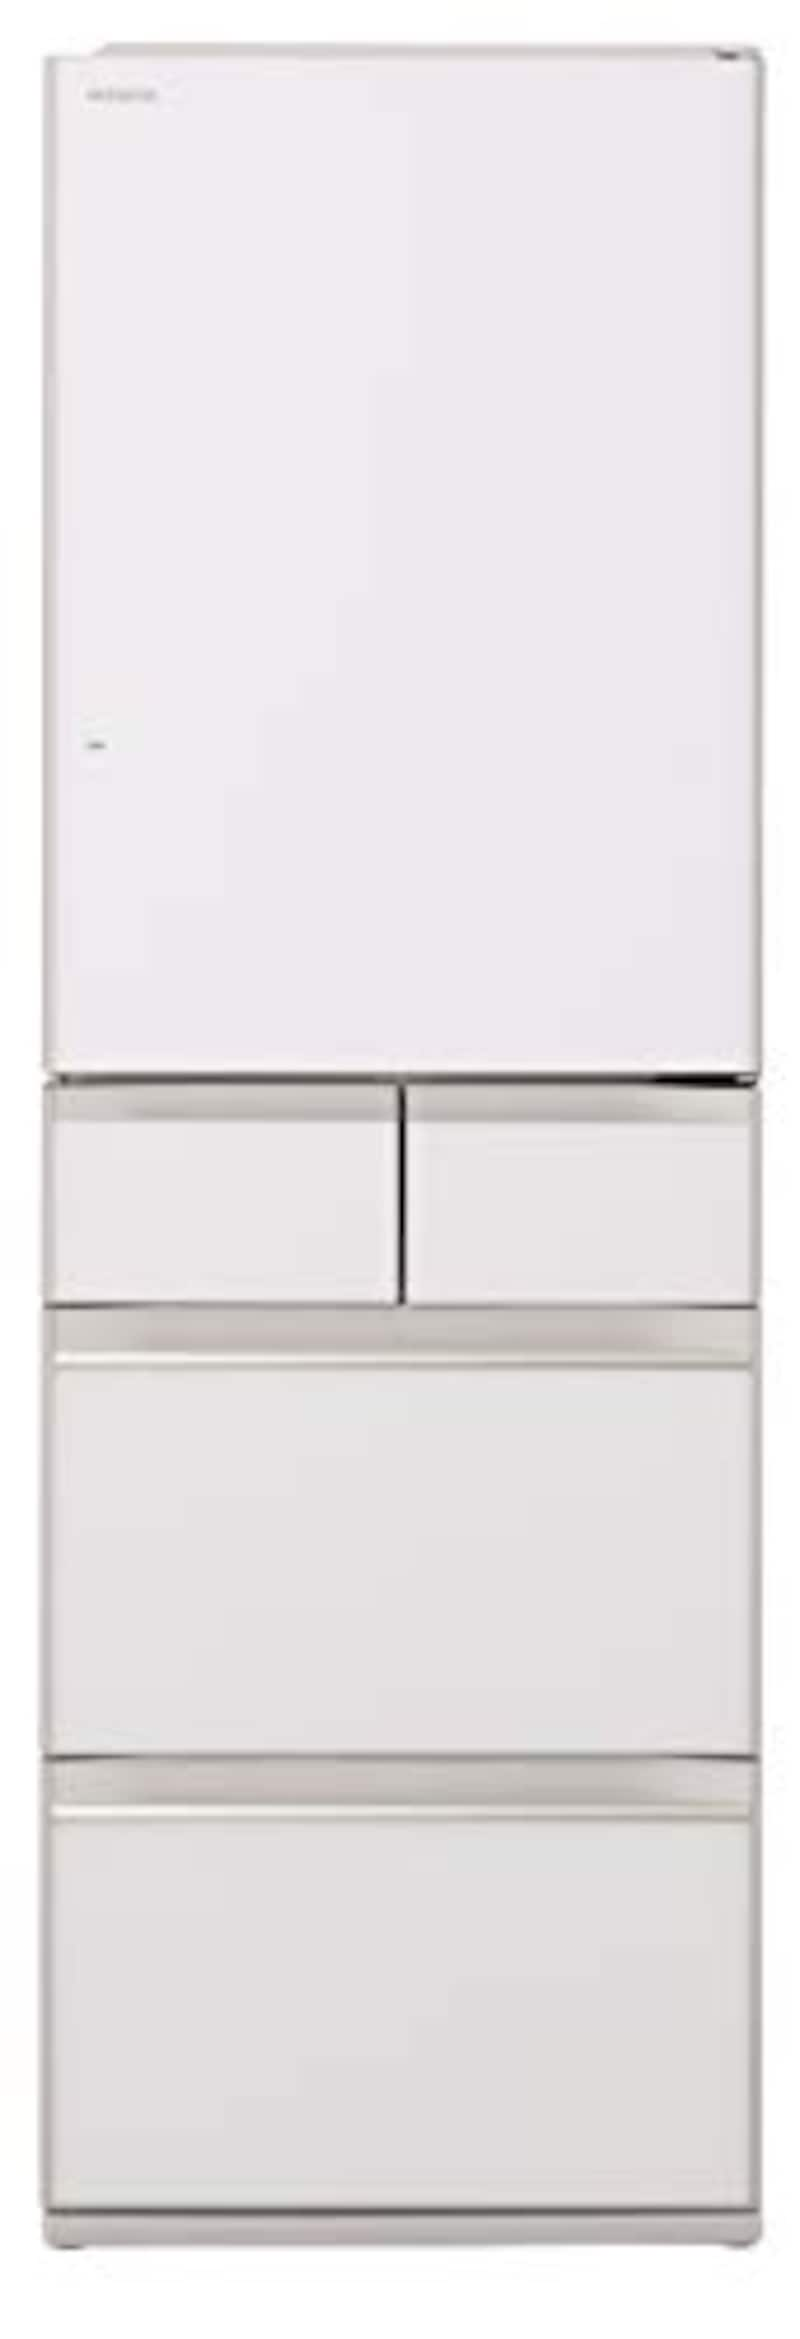 HITACHI(日立),5ドア冷蔵庫 強化処理ガラスドア クリスタルホワイト,R-HWS47K